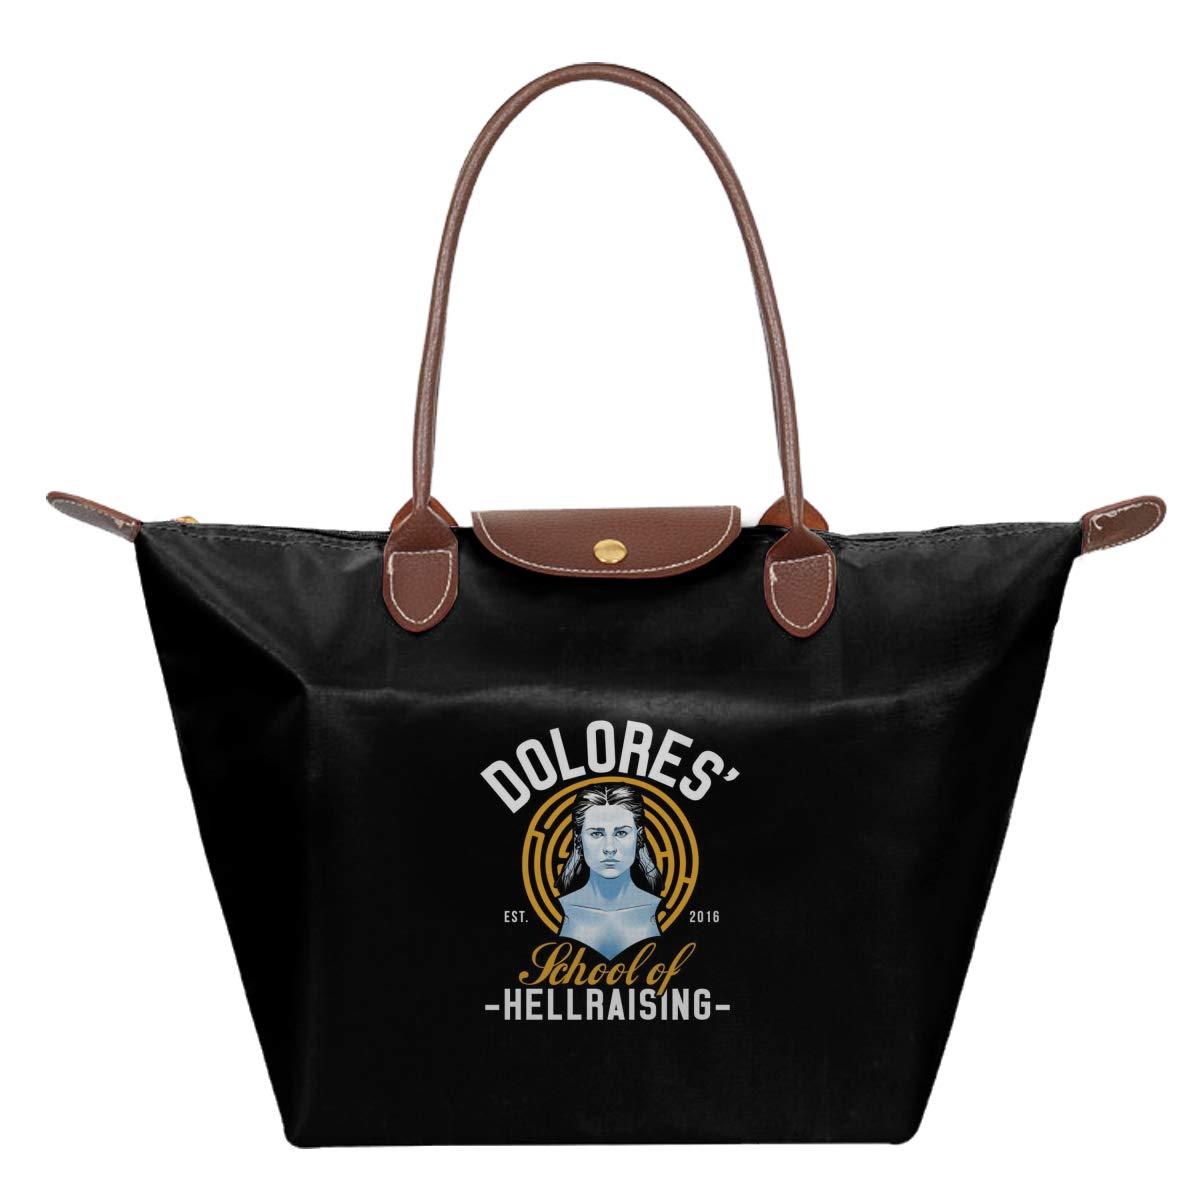 Dolores School Of Hellraising Westworld Waterproof Leather Folded Messenger Nylon Bag Travel Tote Hopping Folding School Handbags